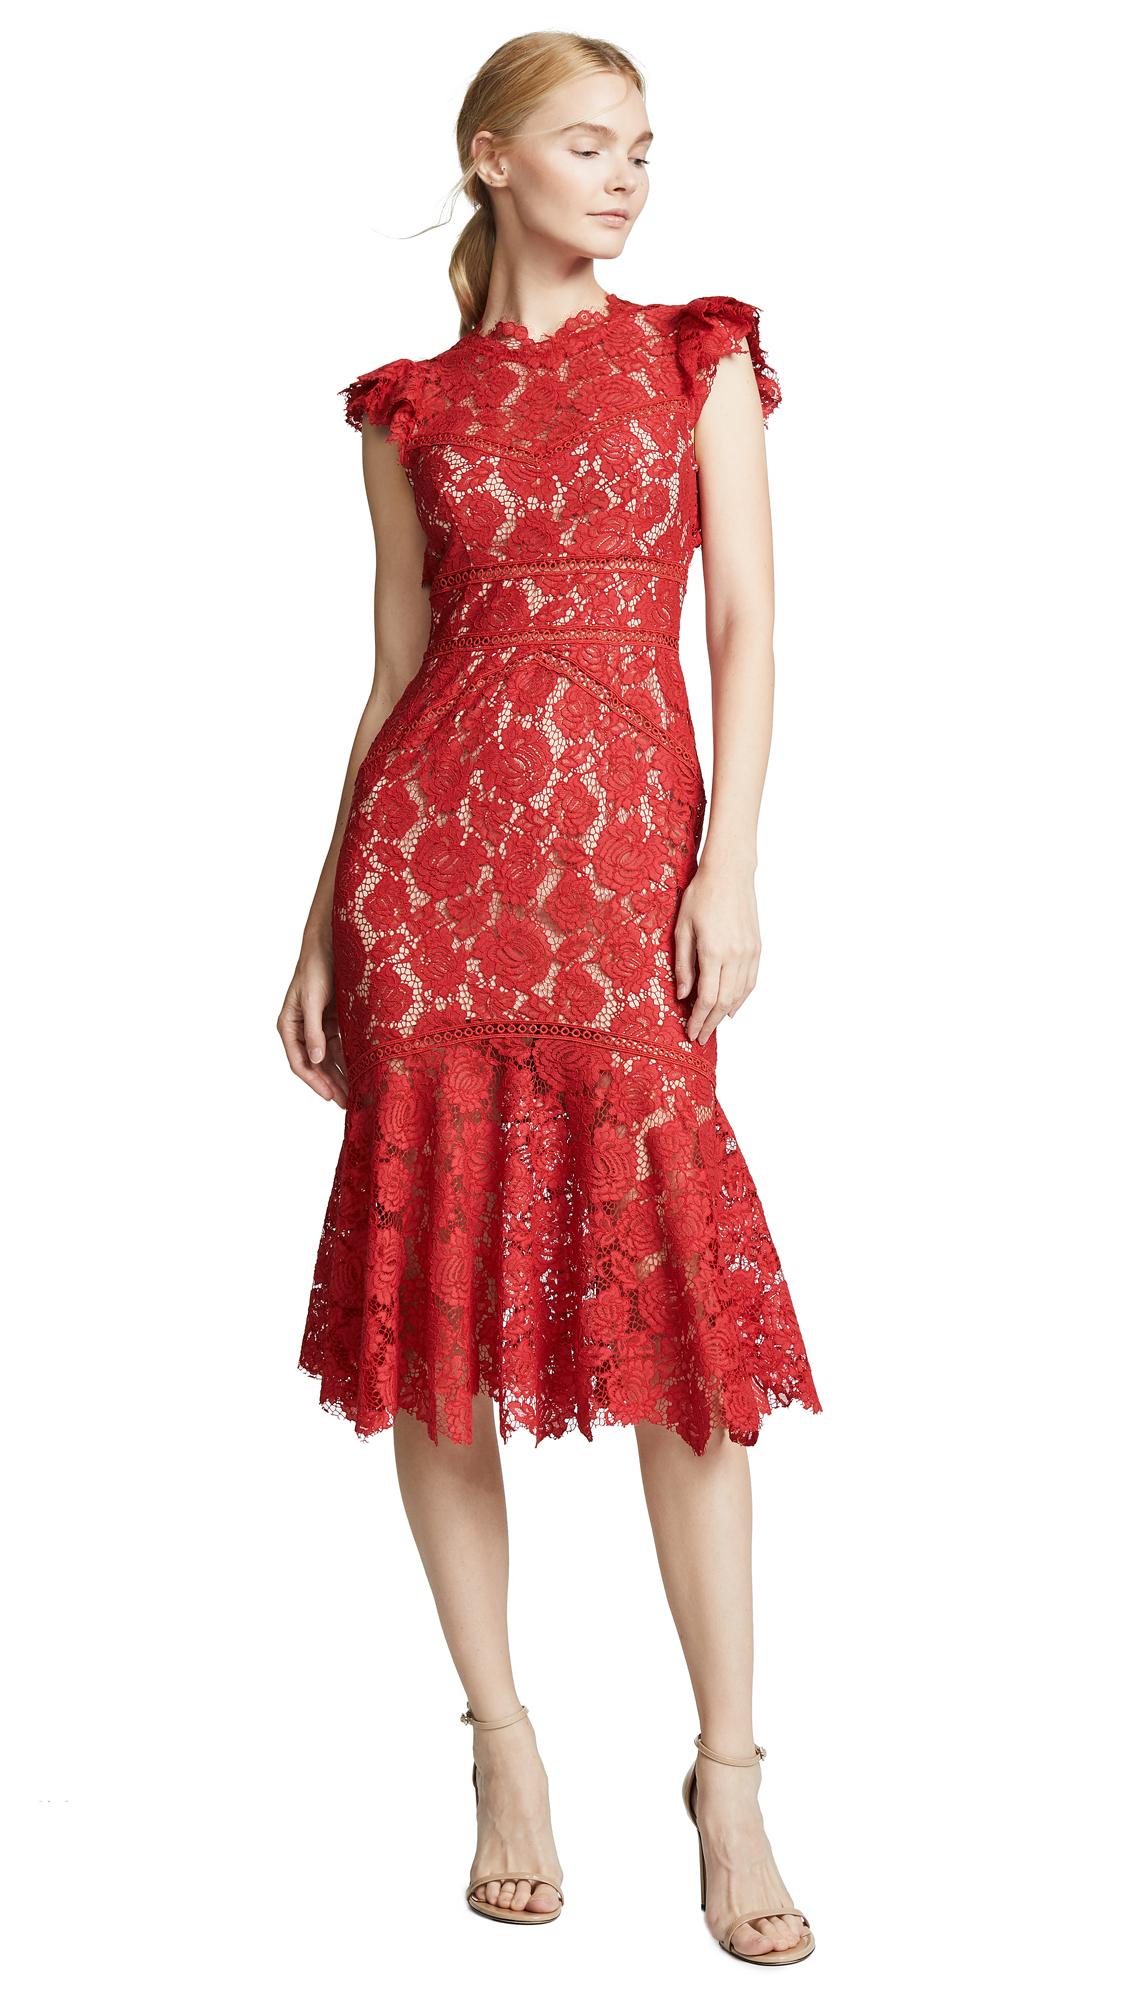 Saylor Maude Dress